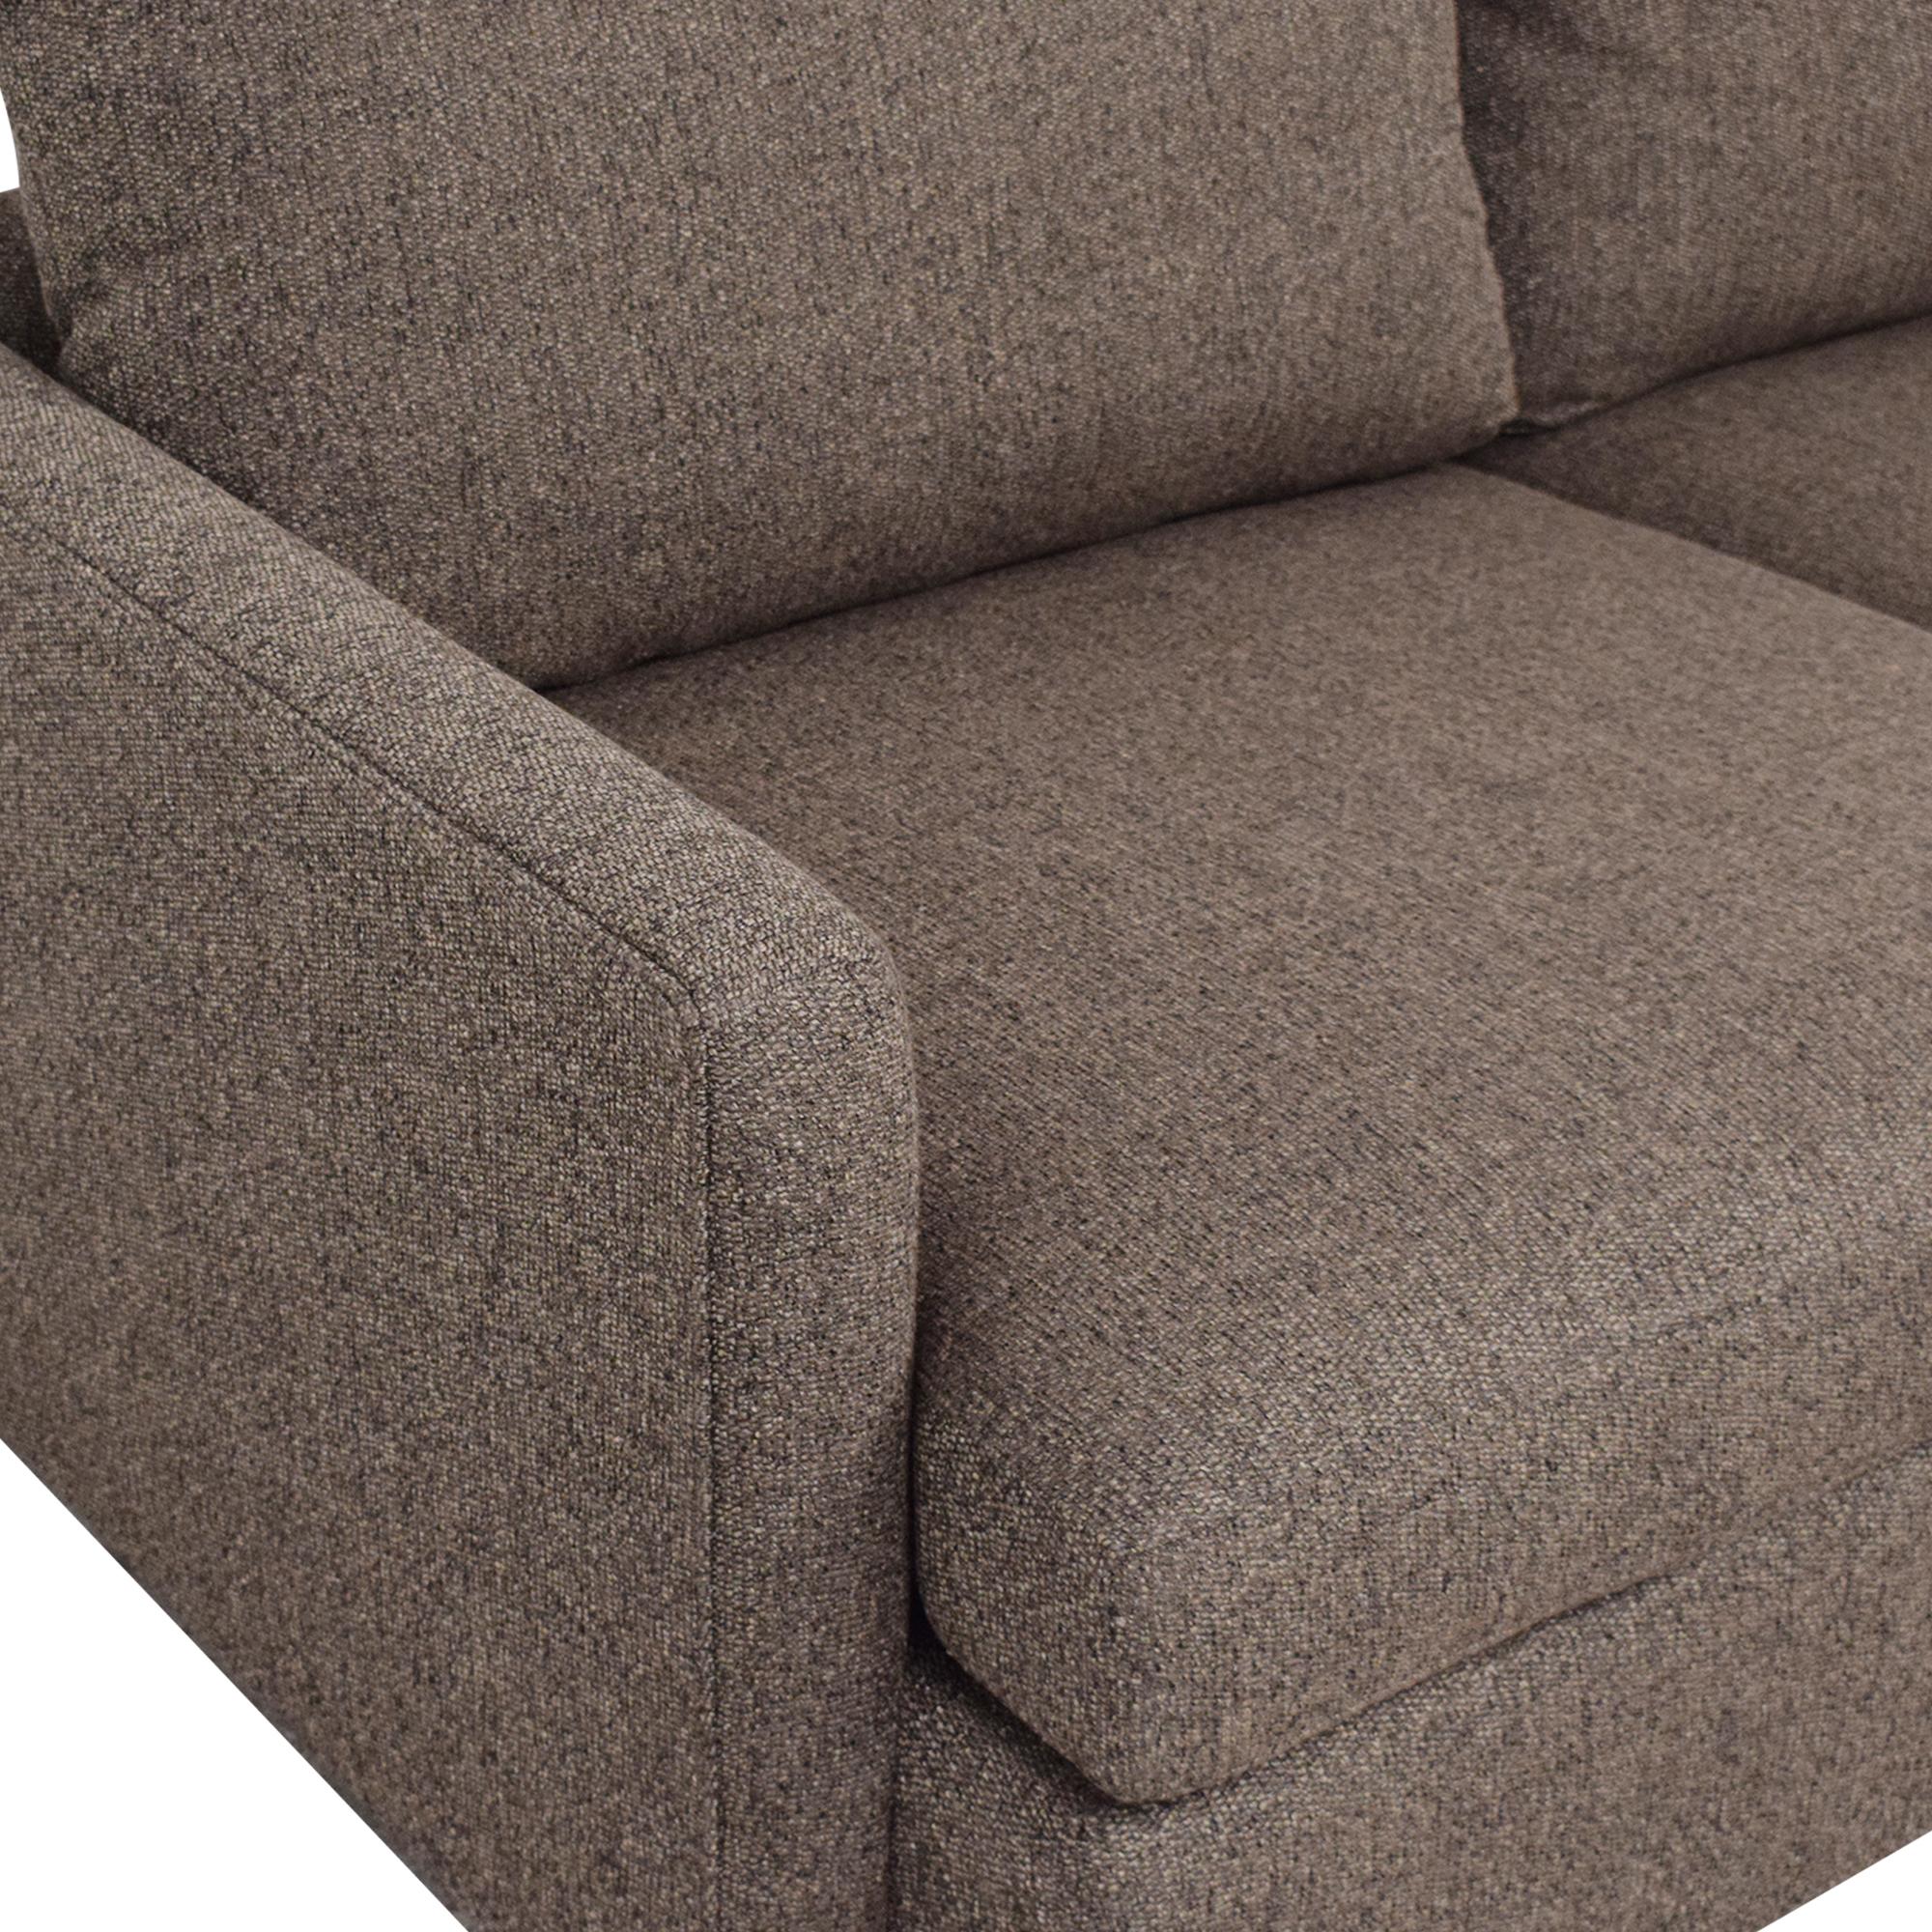 Crate & Barrel Crate & Barrel Lounge II 2-Piece Sectional Sofa discount